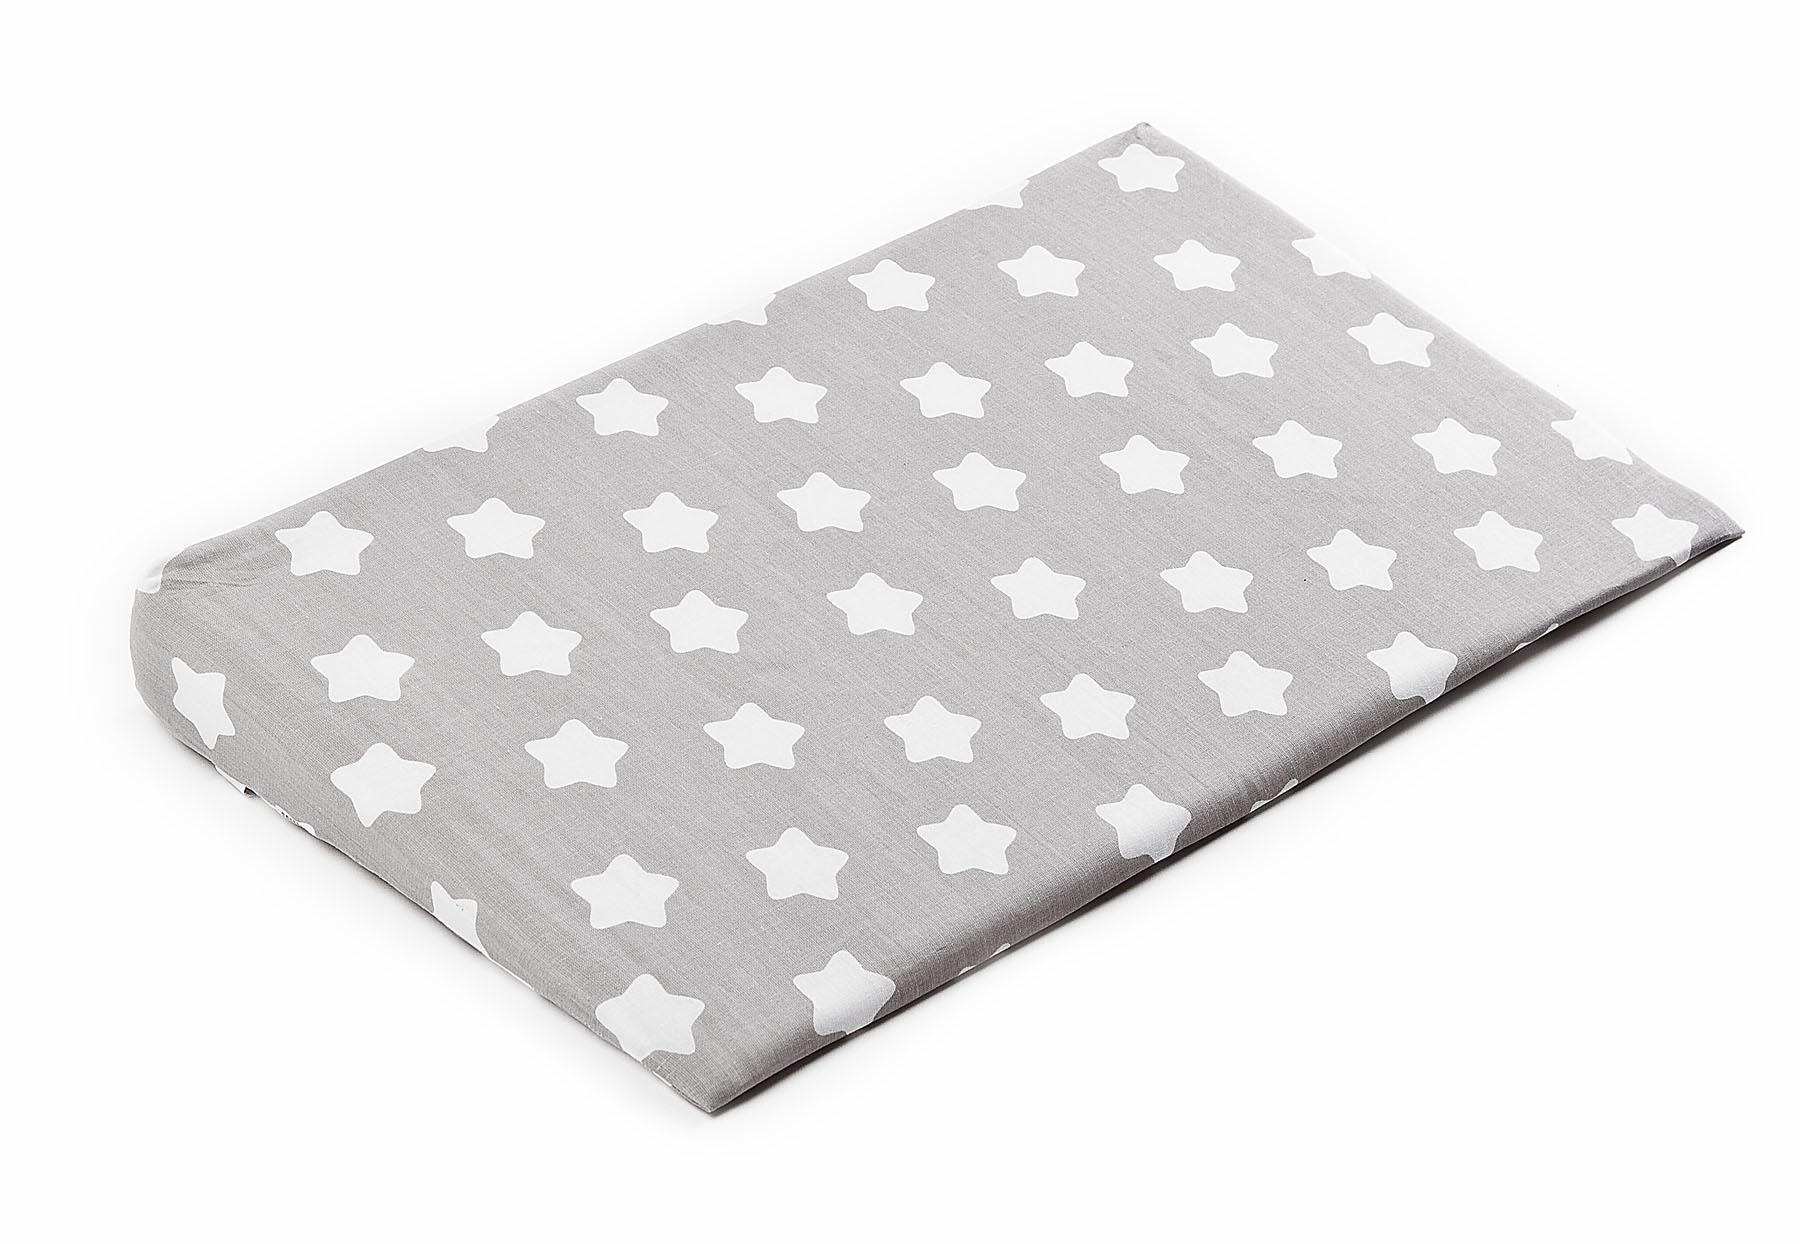 38×60 Wedge Pillowcases – stars grey